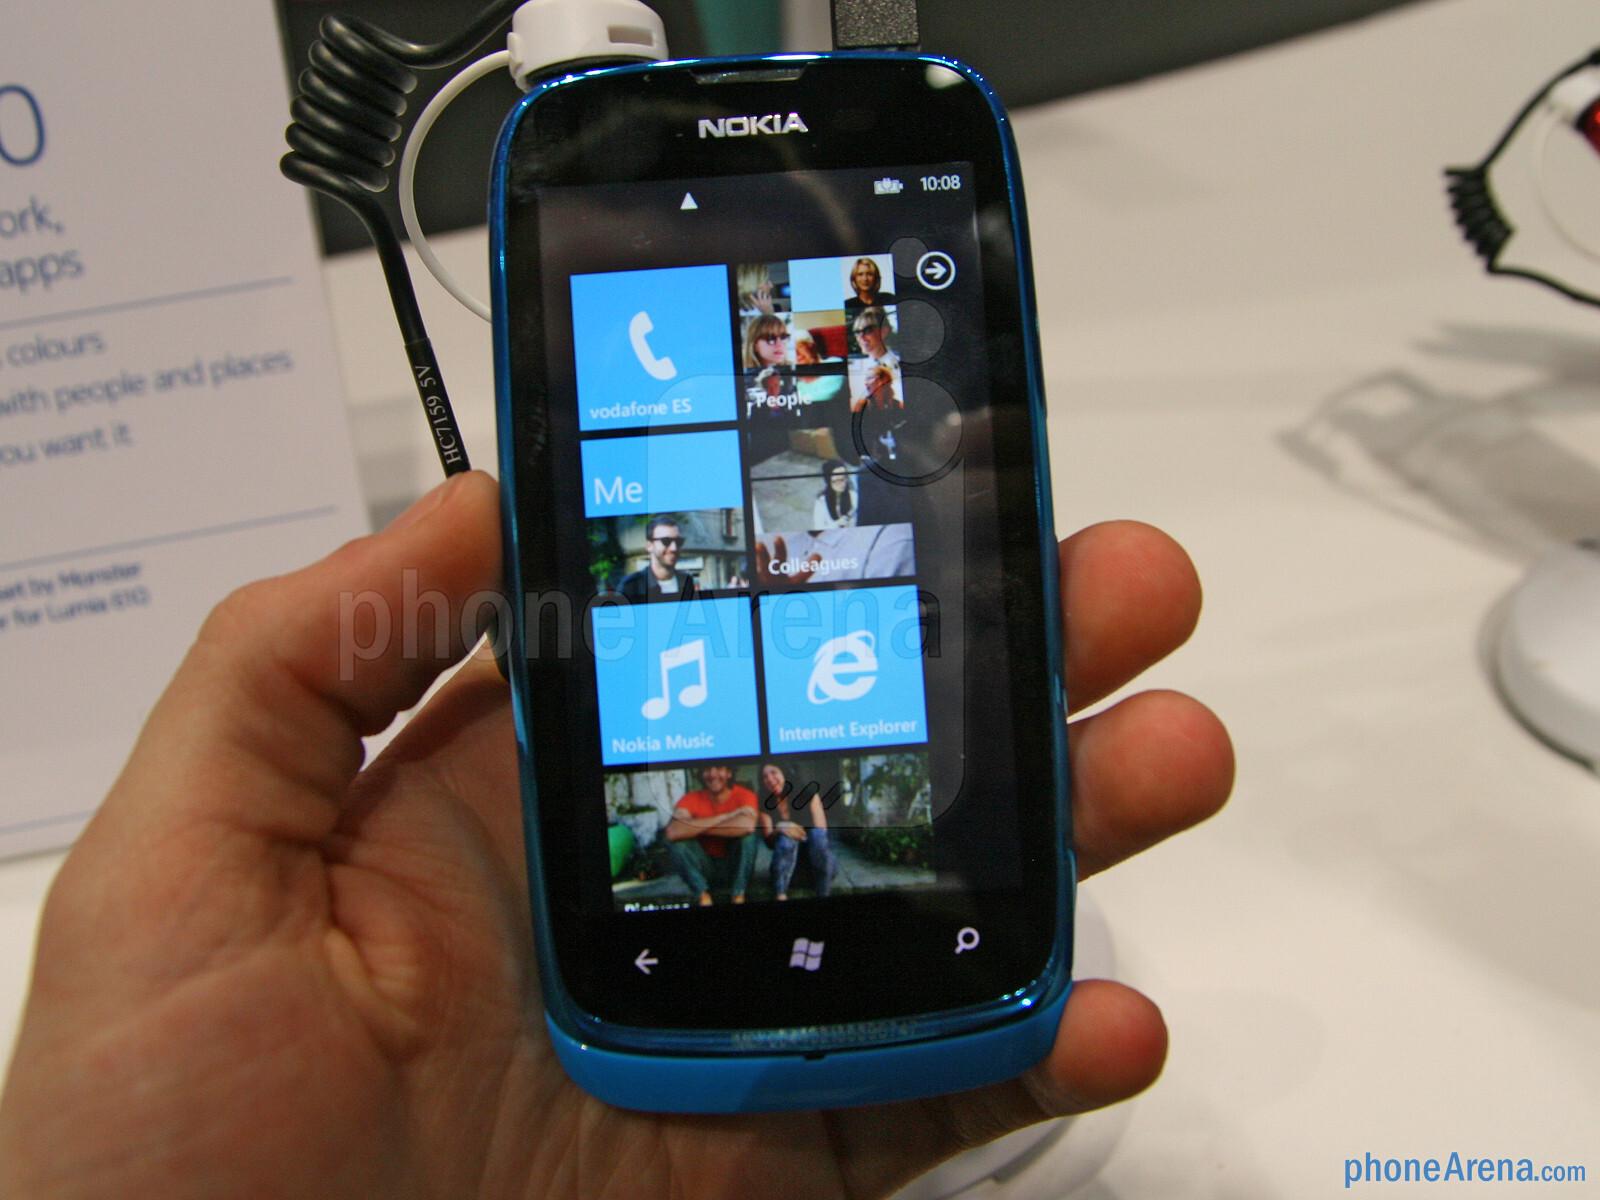 Nokia Lumia 610 Images Nokia Lumia 610 Hands on